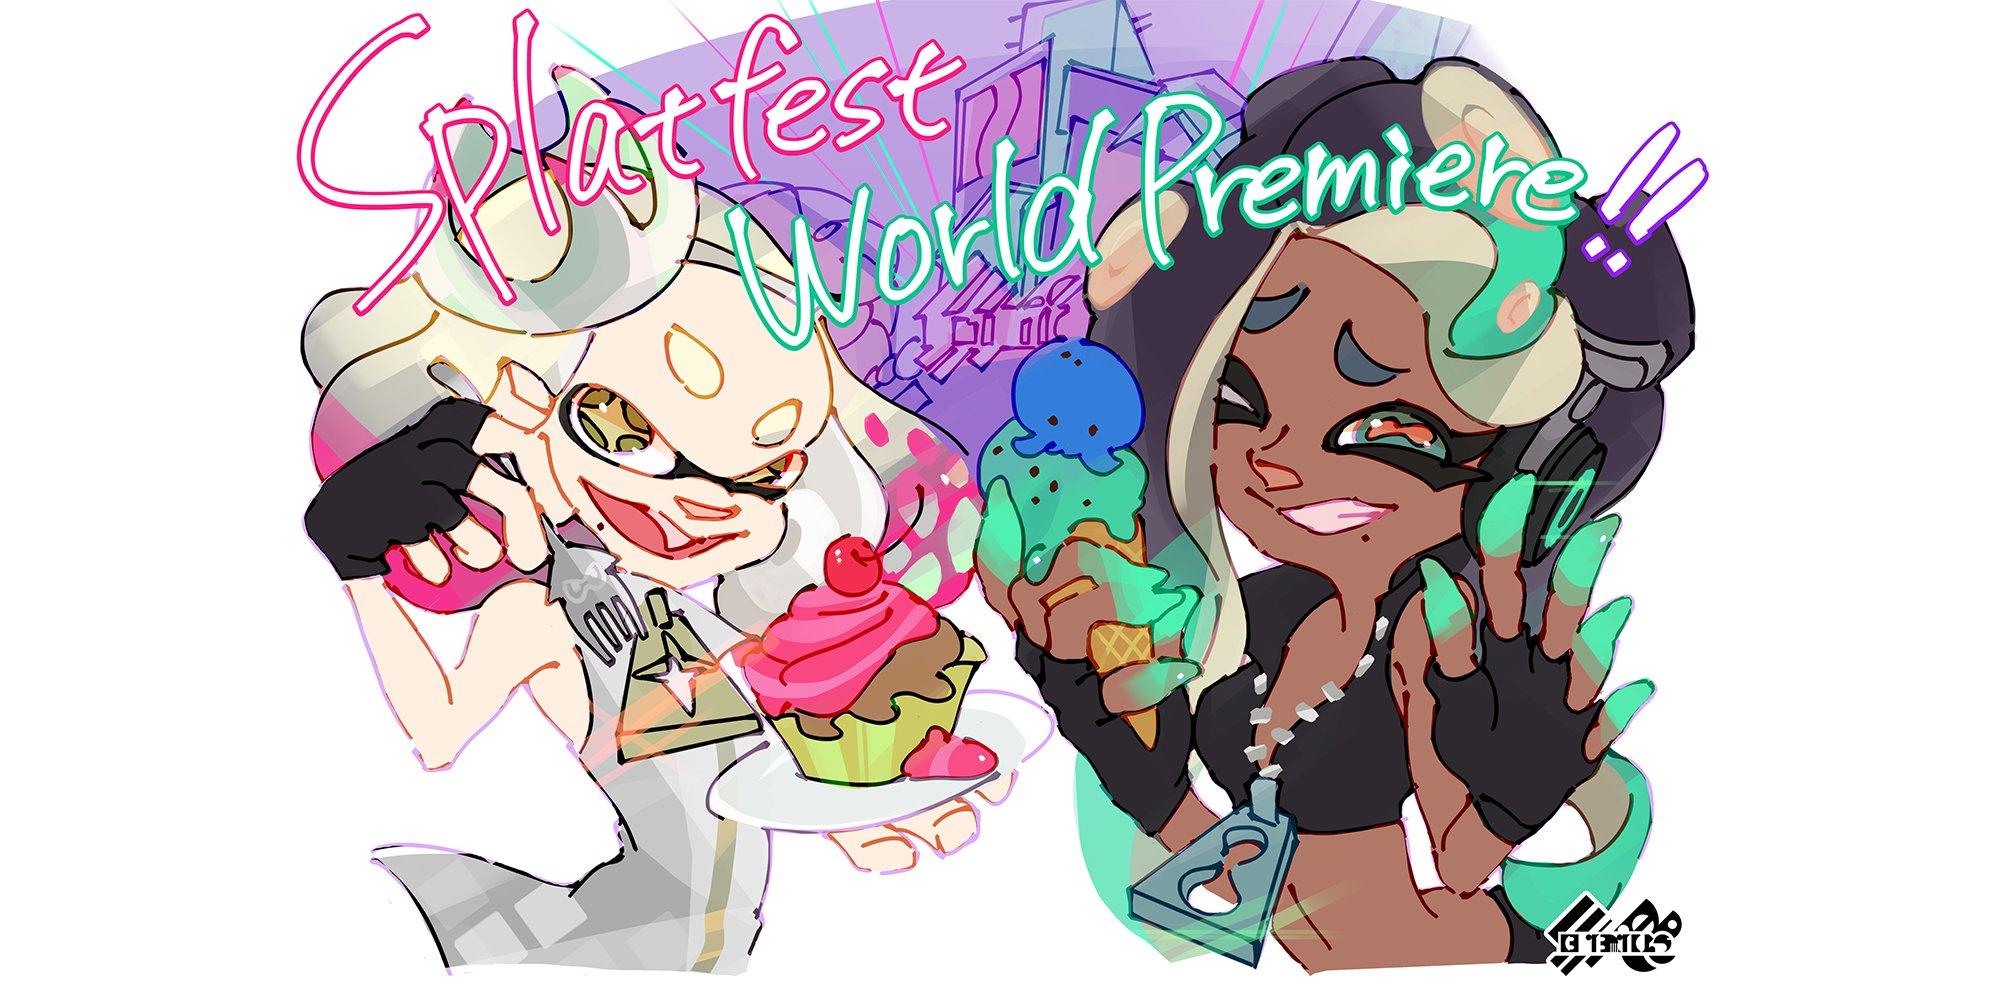 Splatoon 2 Cake Vs Ice Cream Splatfest Art Nintendo